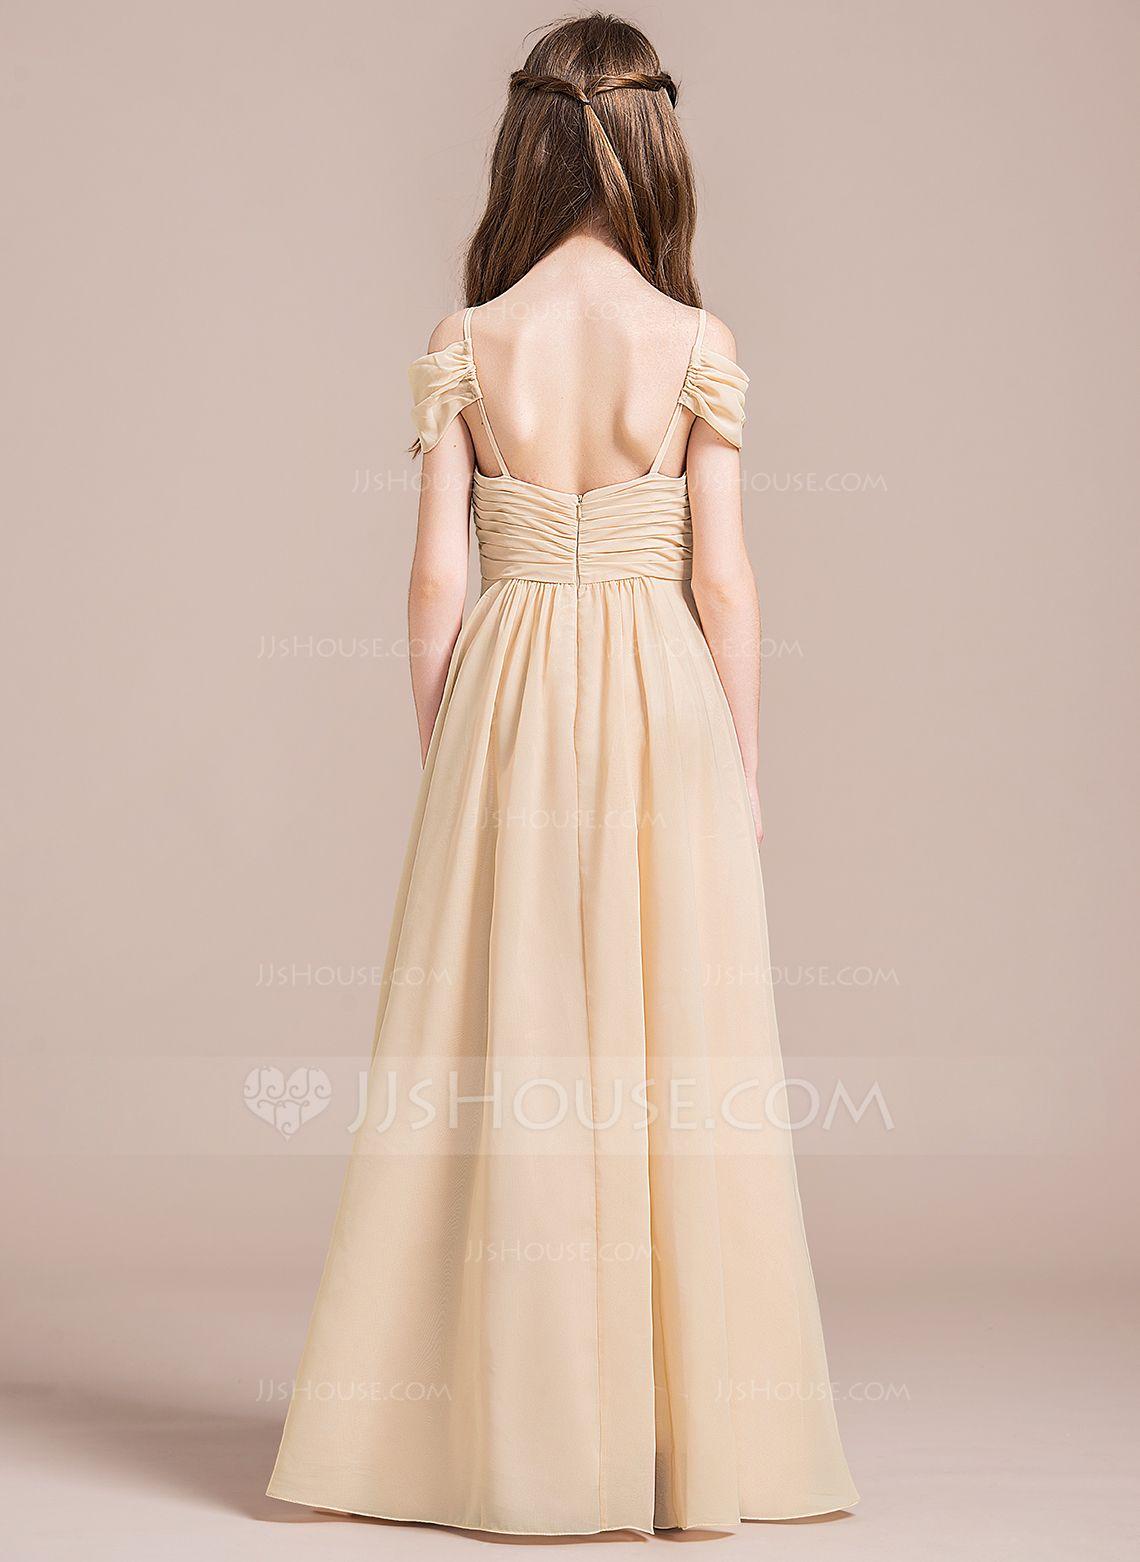 Champagne Chiffon Junior Bridesmaid Dresses